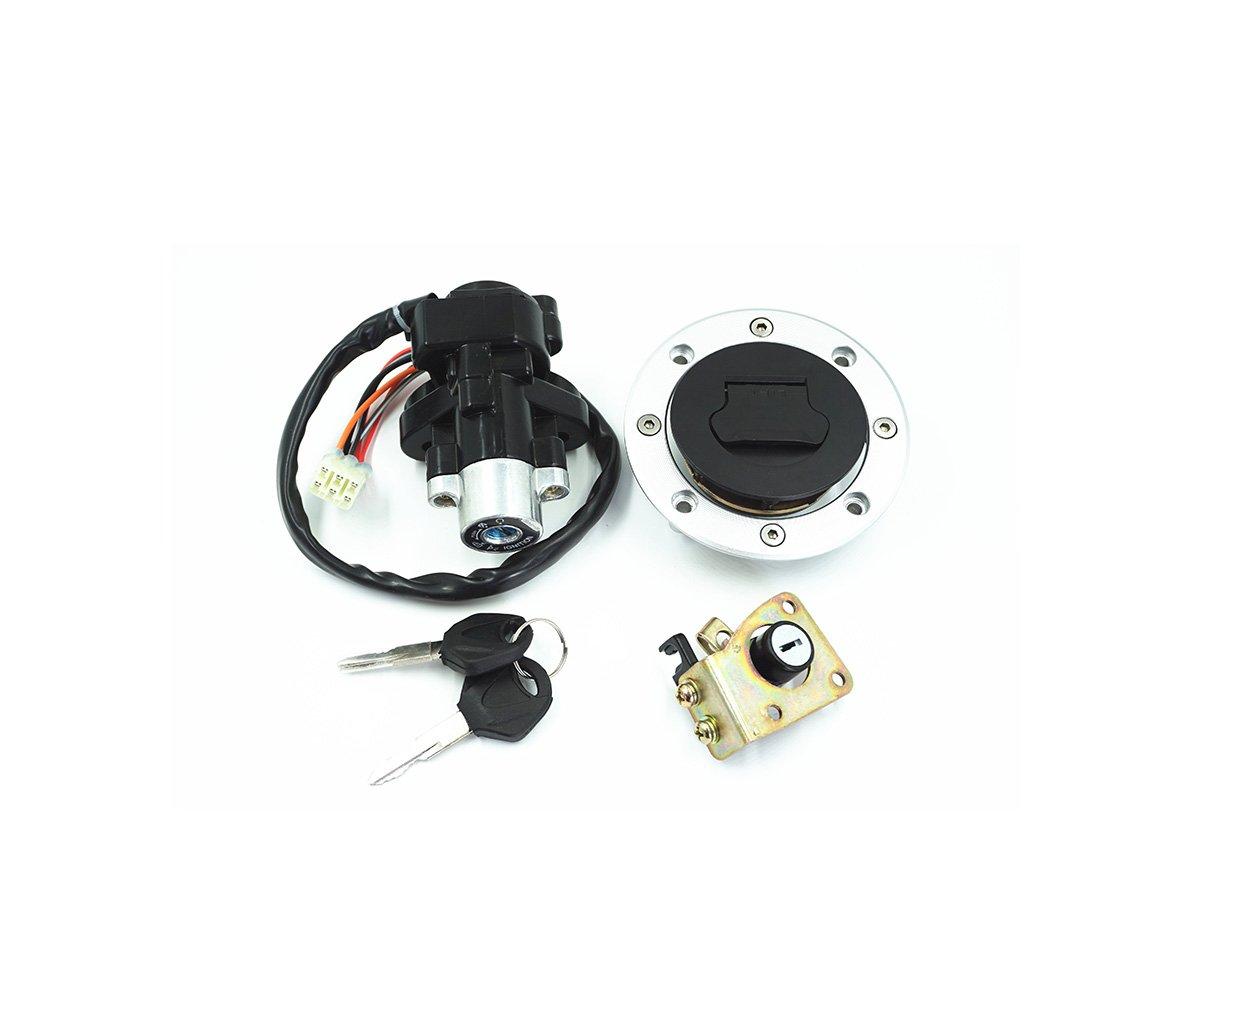 EODUDO-S Motorcycle Seat Lock 2 Line Ignition Switch Fuel Gas Cap Lock Key for Suzuki GSXR600 Motorcycle & Powersports